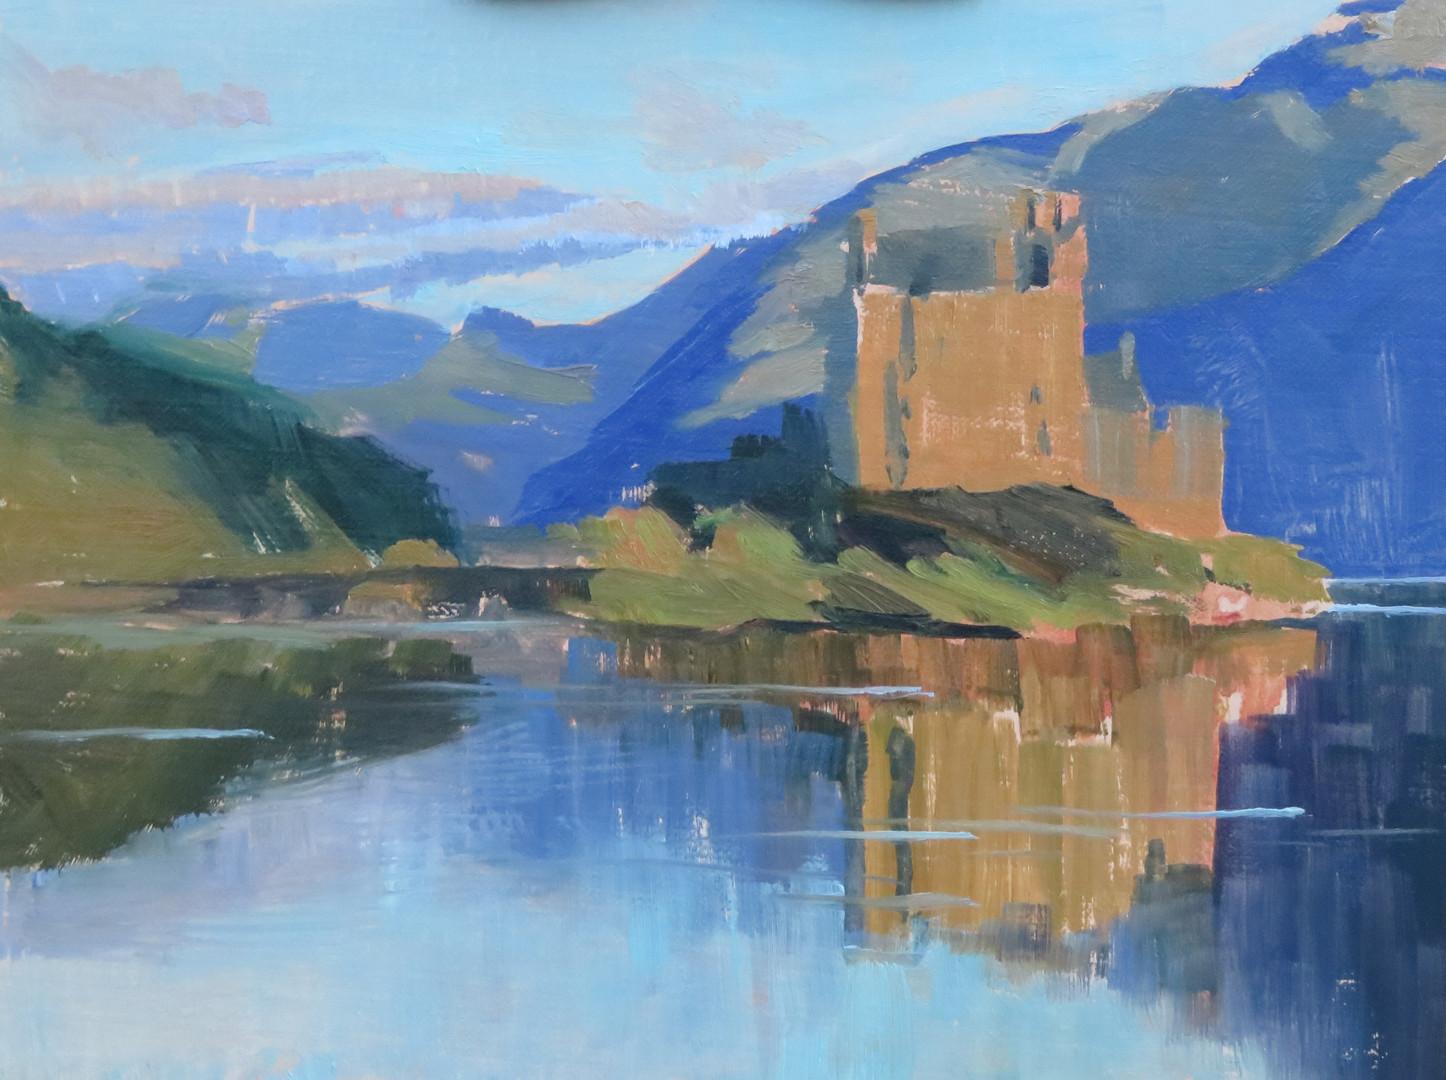 Eilean Donan Castle at Sunset, Scotland